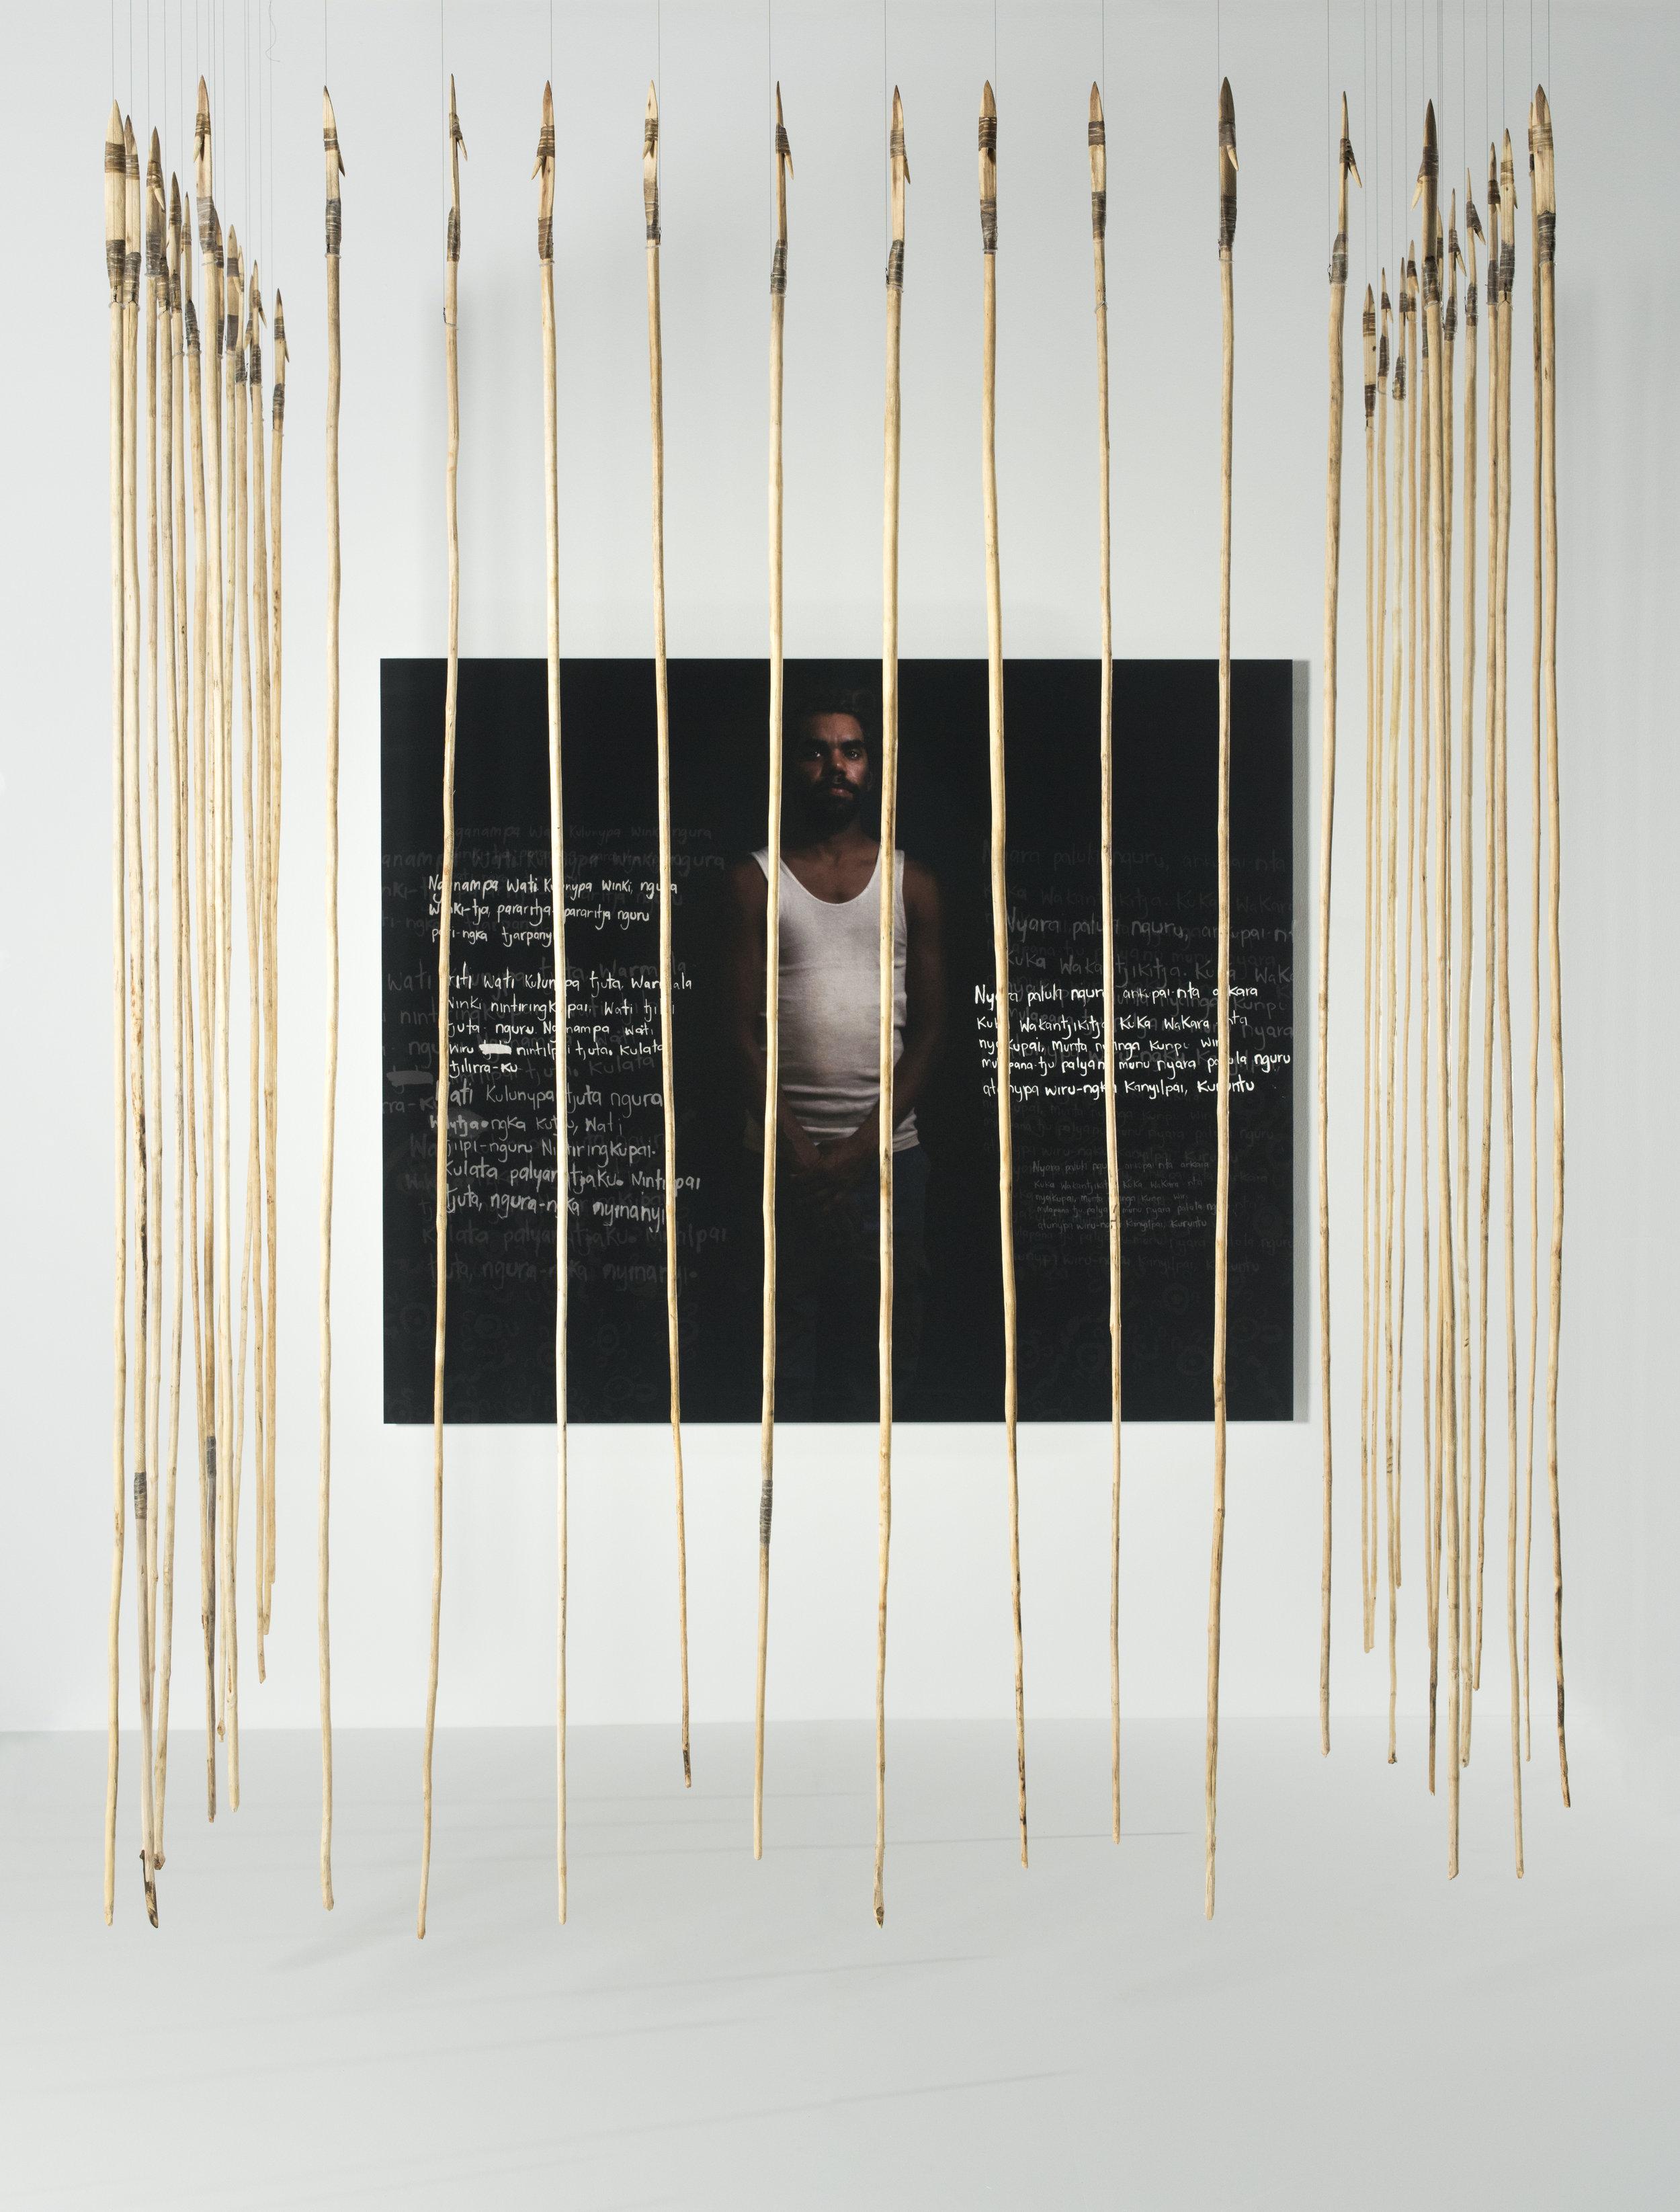 Anwar Young, Unrupa Rhonda Dick and Frank Young,  Kulata Tjuta – Wati kulunypa tjukurpa (Many spears – Young fella story) , 2017, digital print, wood, kangaroo tendon,  kiti  (natural glue); print 148 x 176cm; spears 280 x 2 x 2cm approx. (37 pieces); image courtesy the artists and the Museum and Art Gallery of the Northern Territory, Darwin